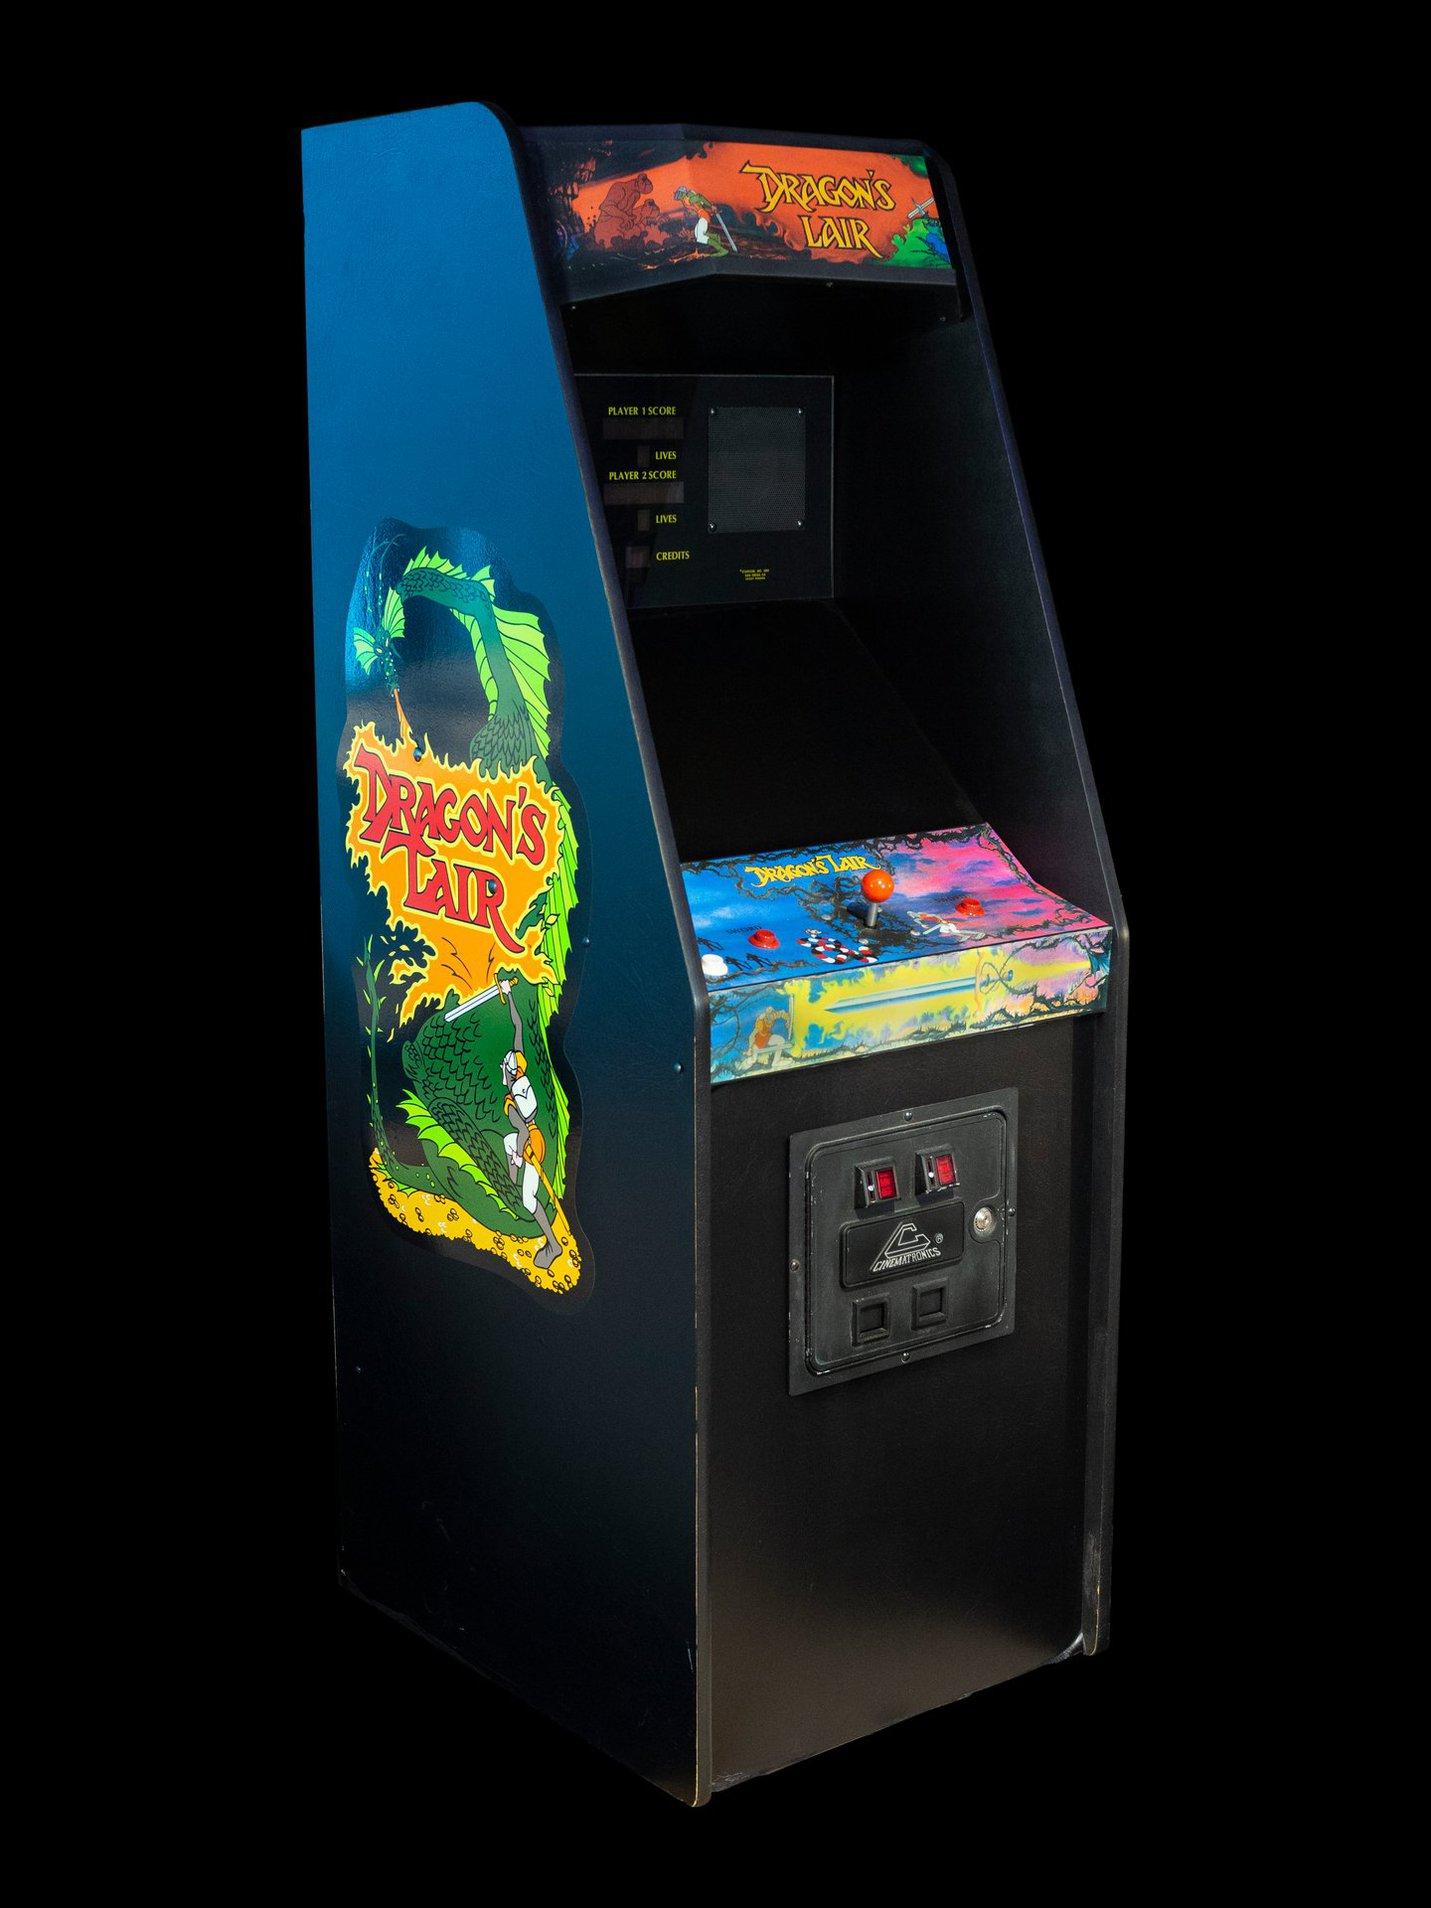 Original Dragons Lair arcade game